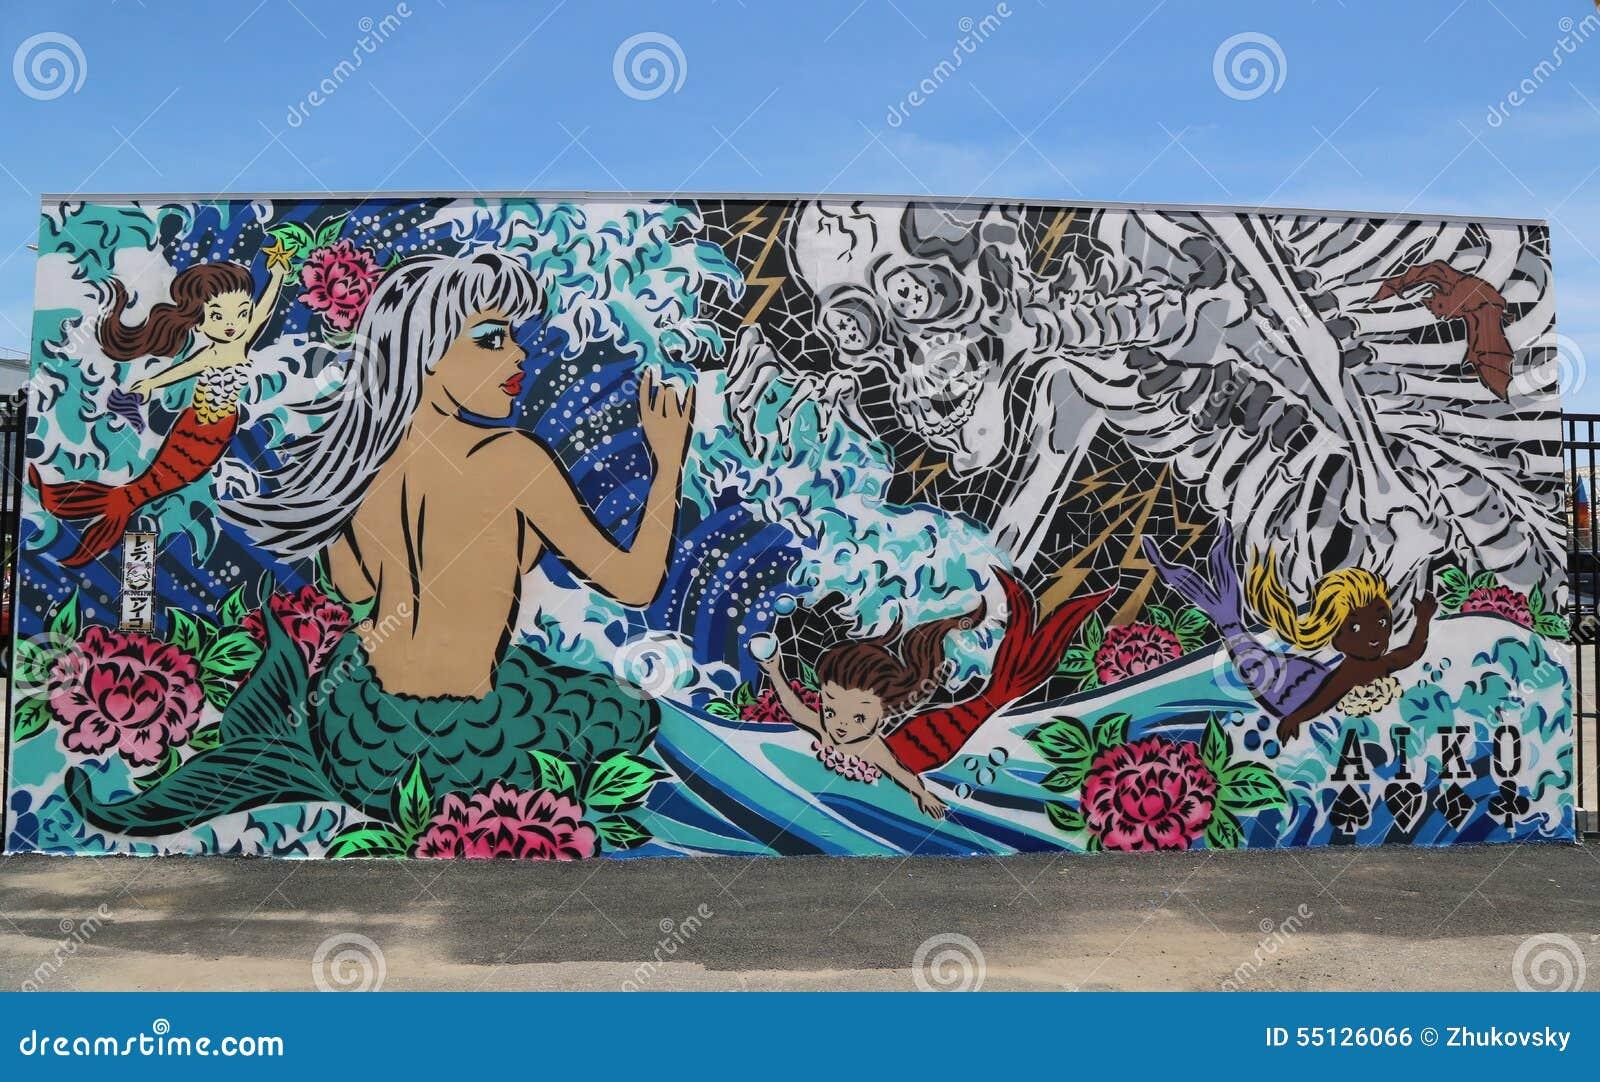 Art Walls mural art at new street art attraction coney art walls at coney